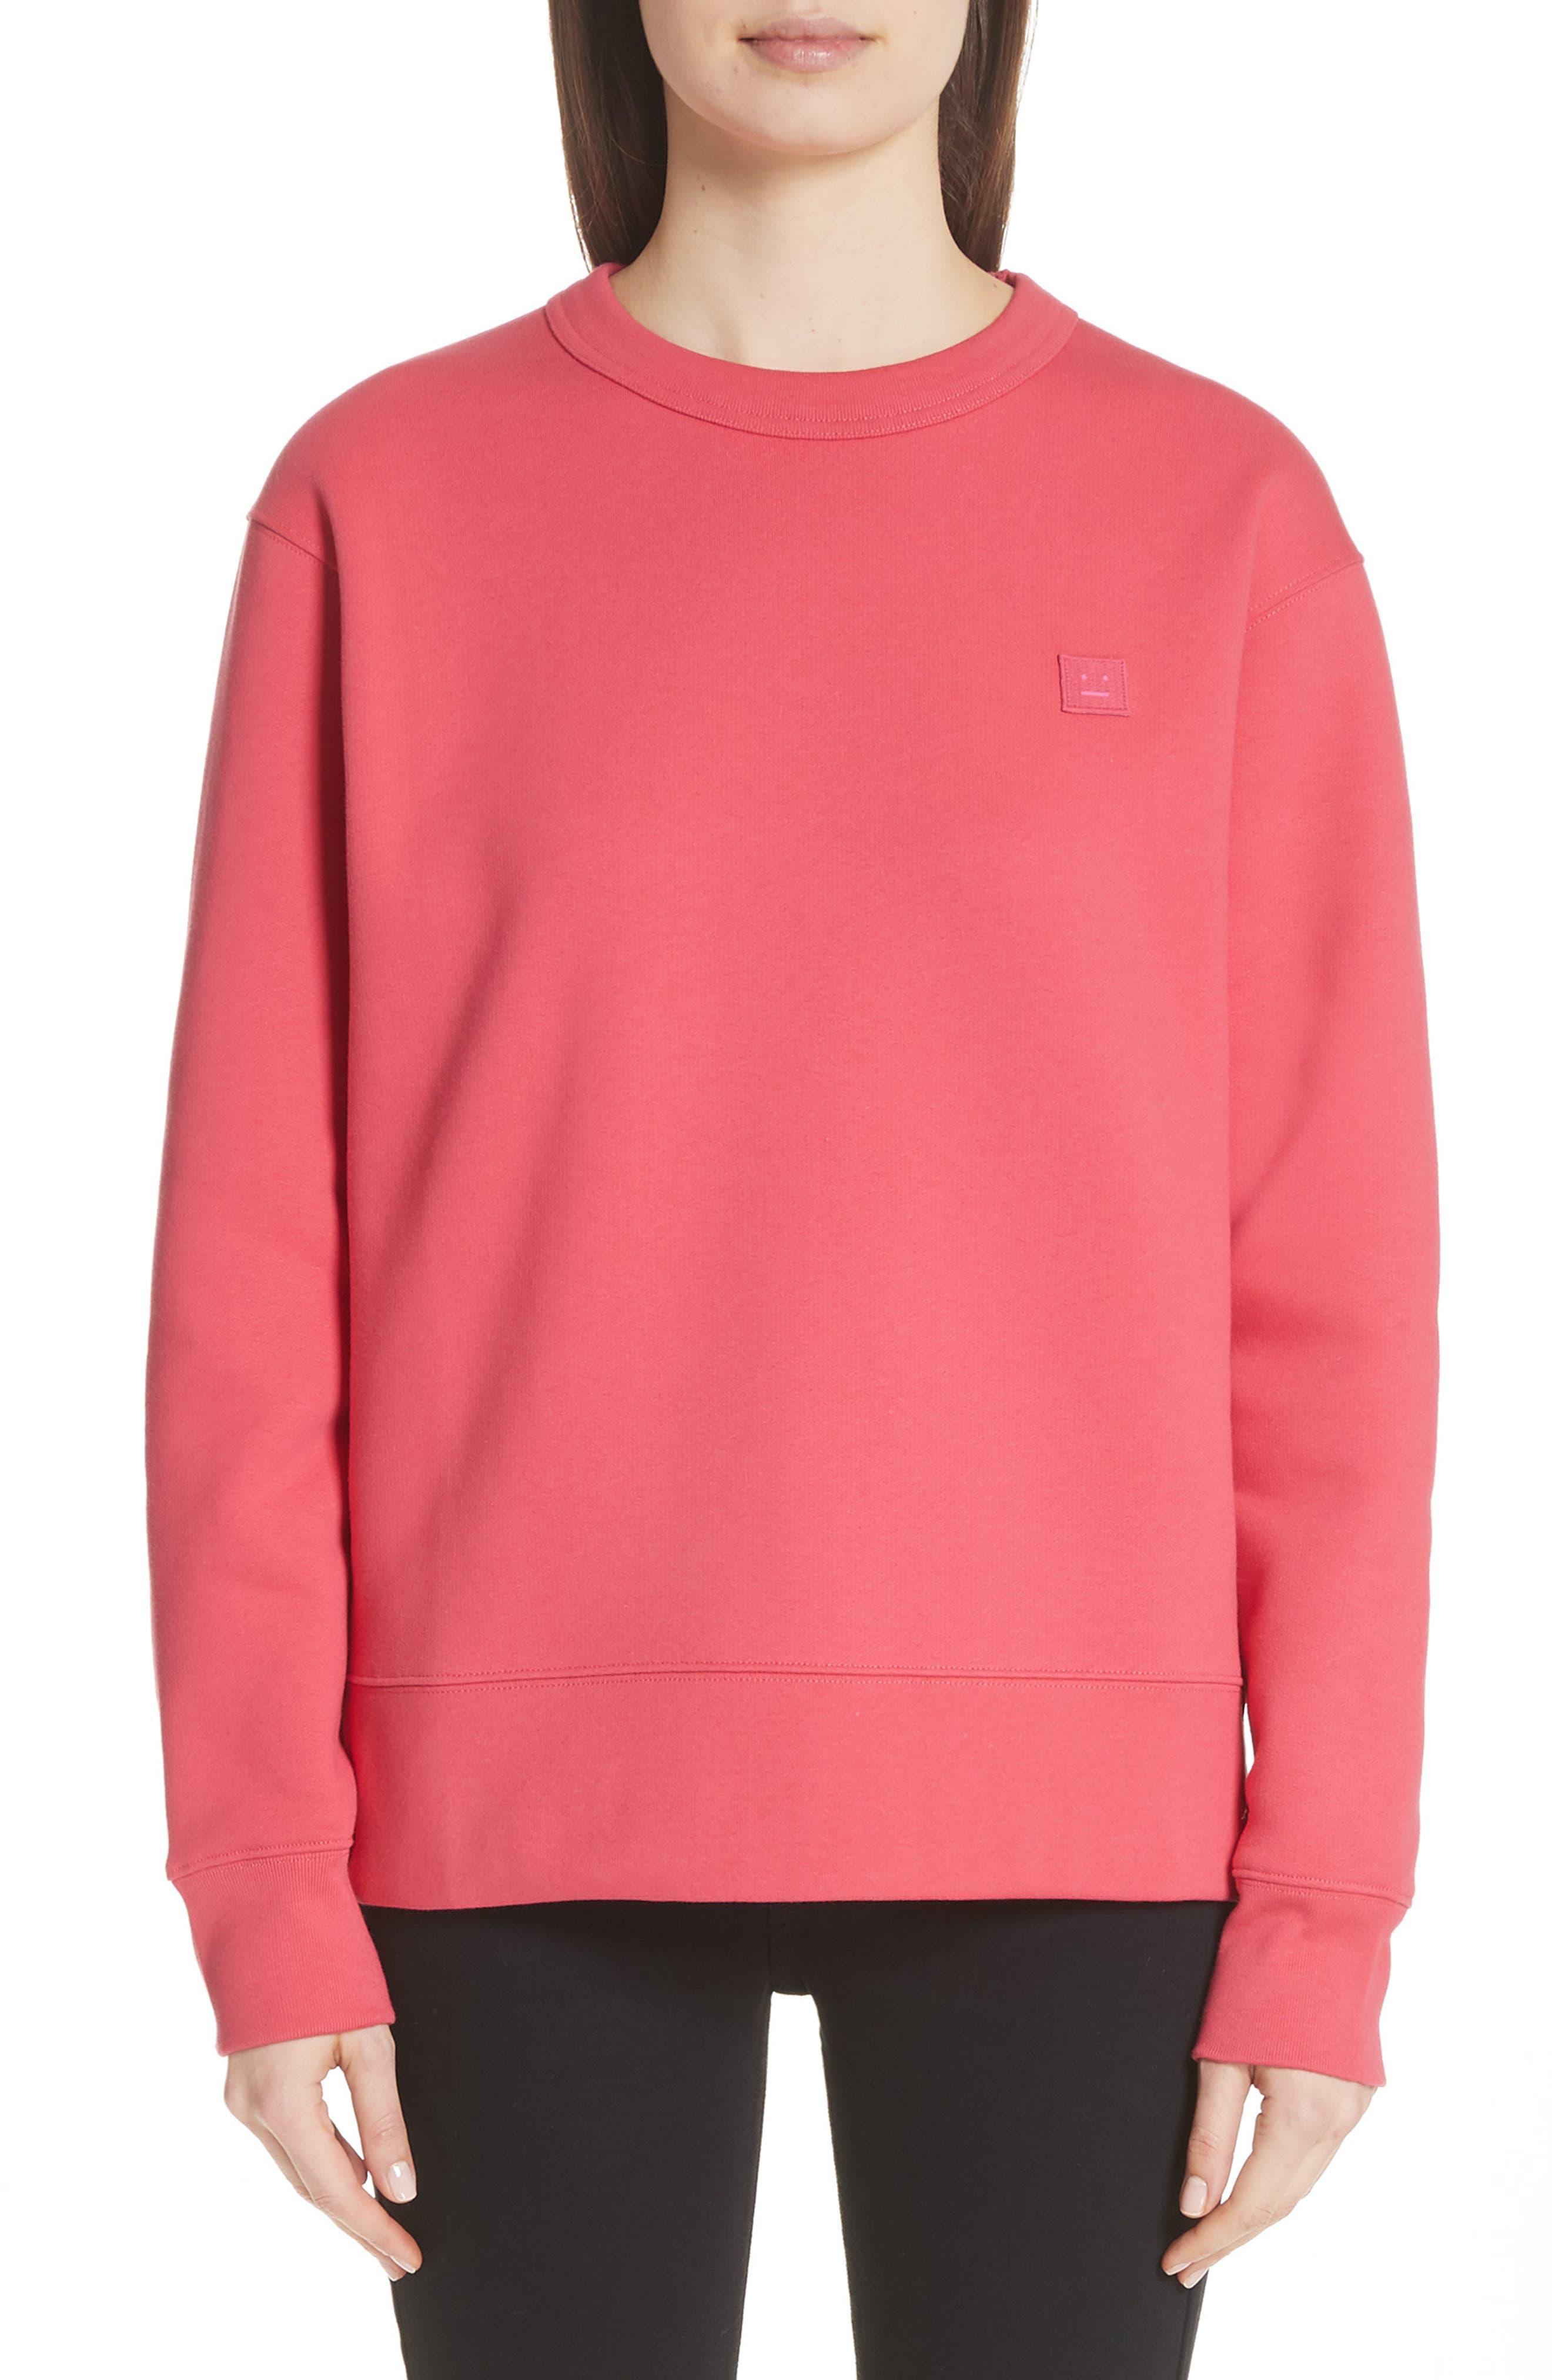 Fairview Crewneck Sweatshirt,                             Main thumbnail 1, color,                             Neon Pink